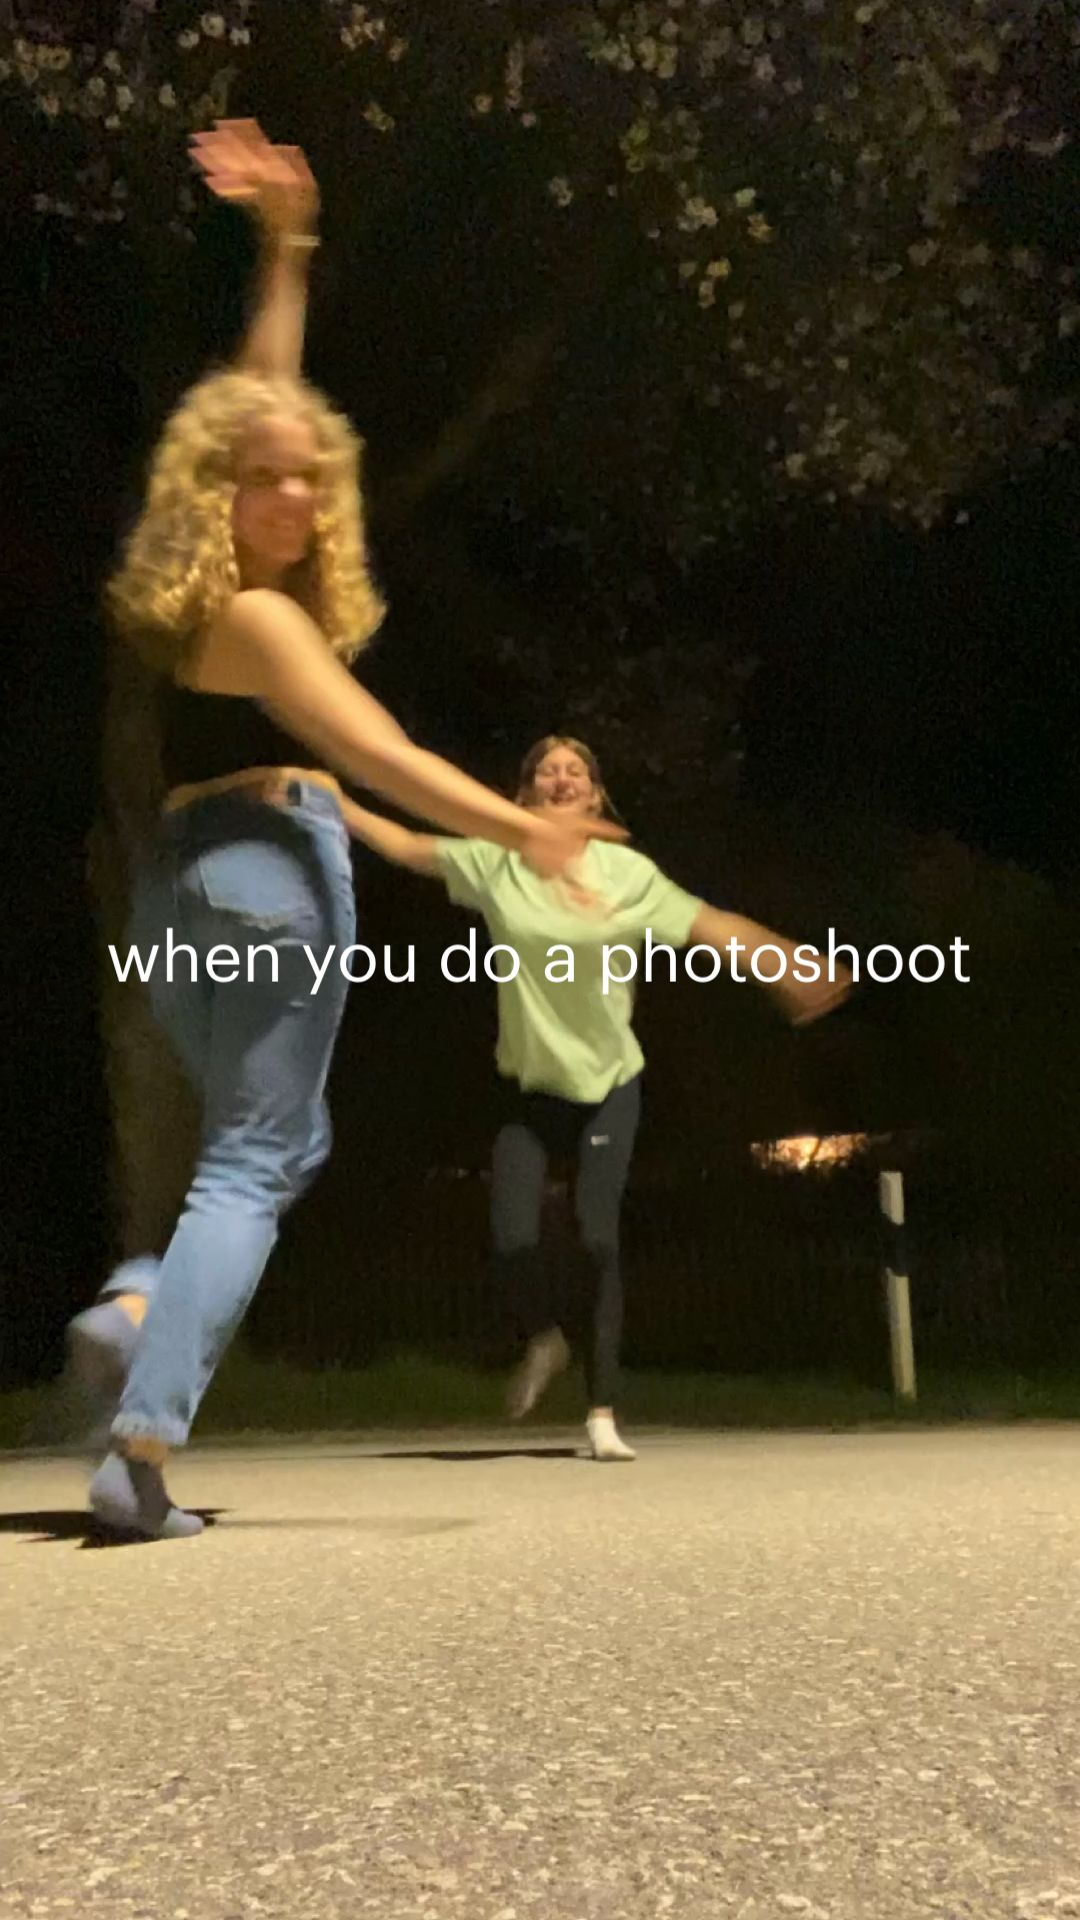 photoshoot at night